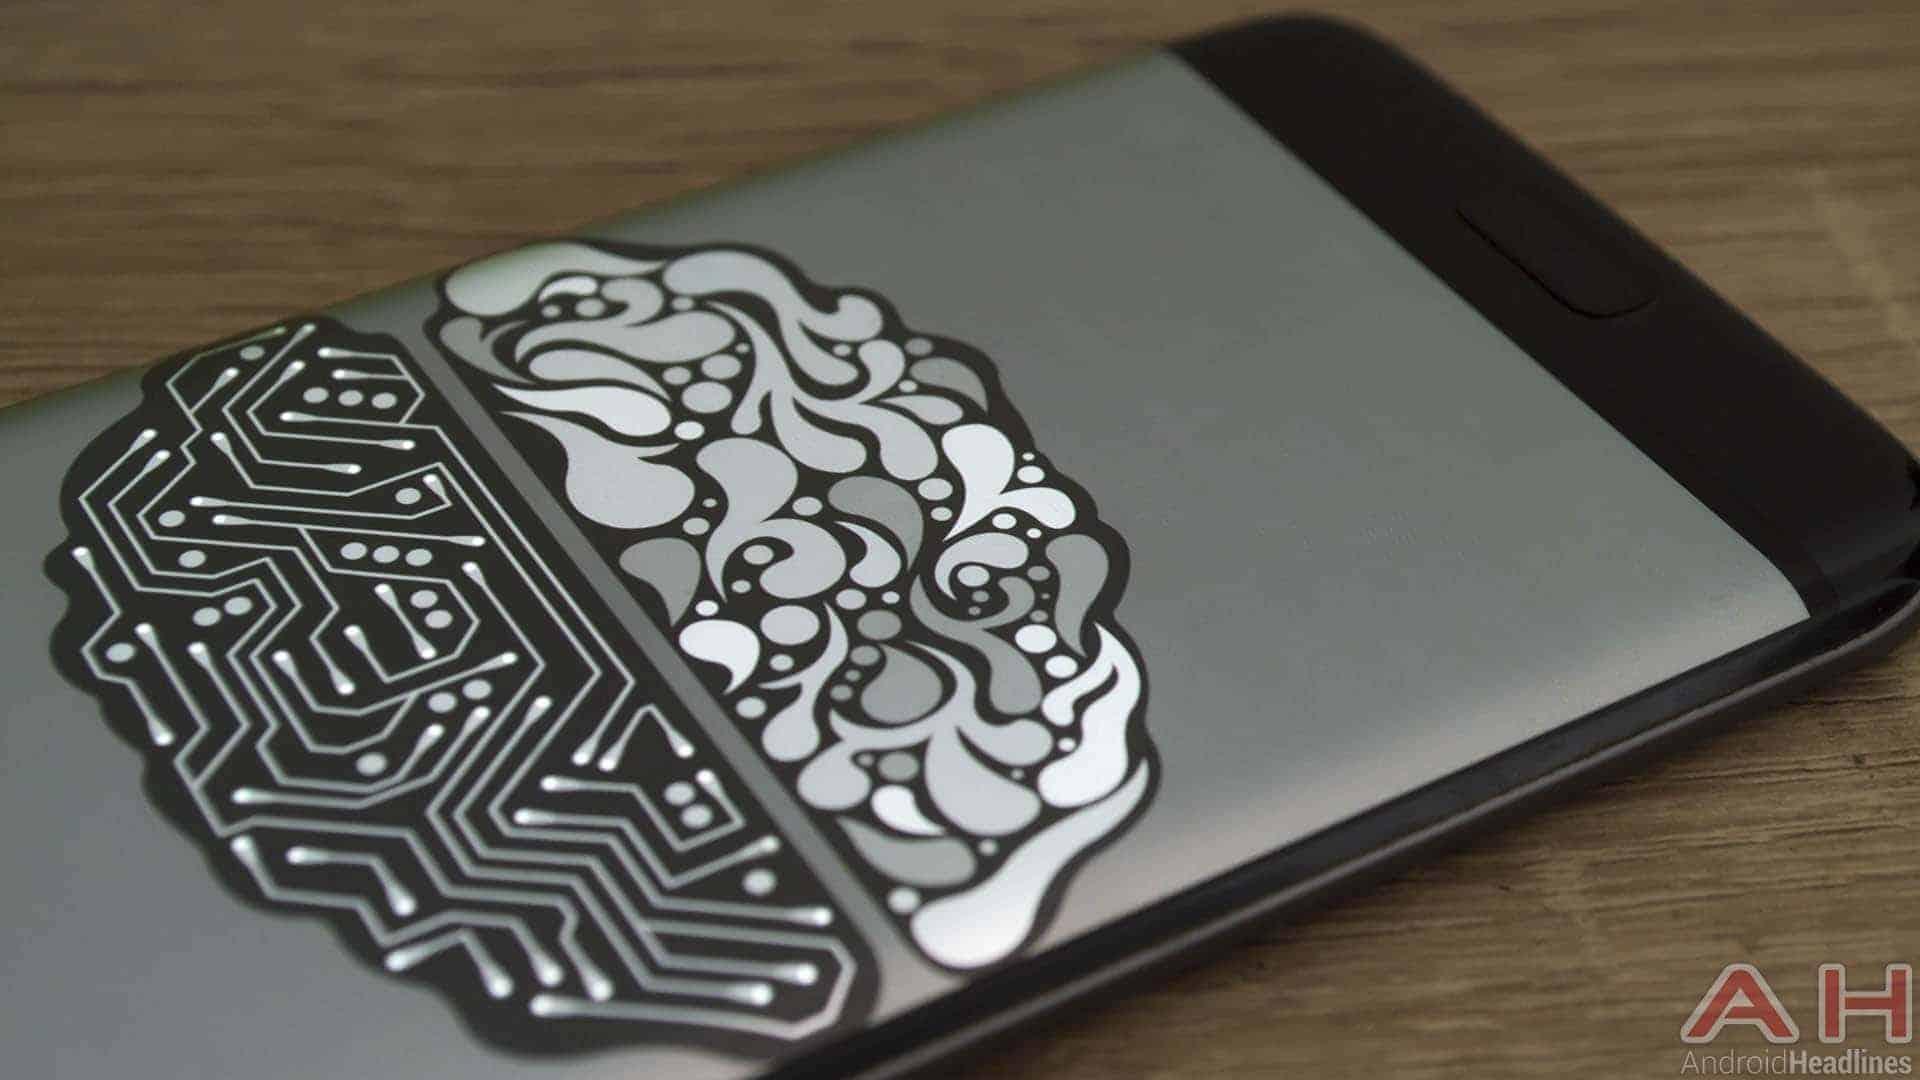 Artificial Intelligence AI Brain AH